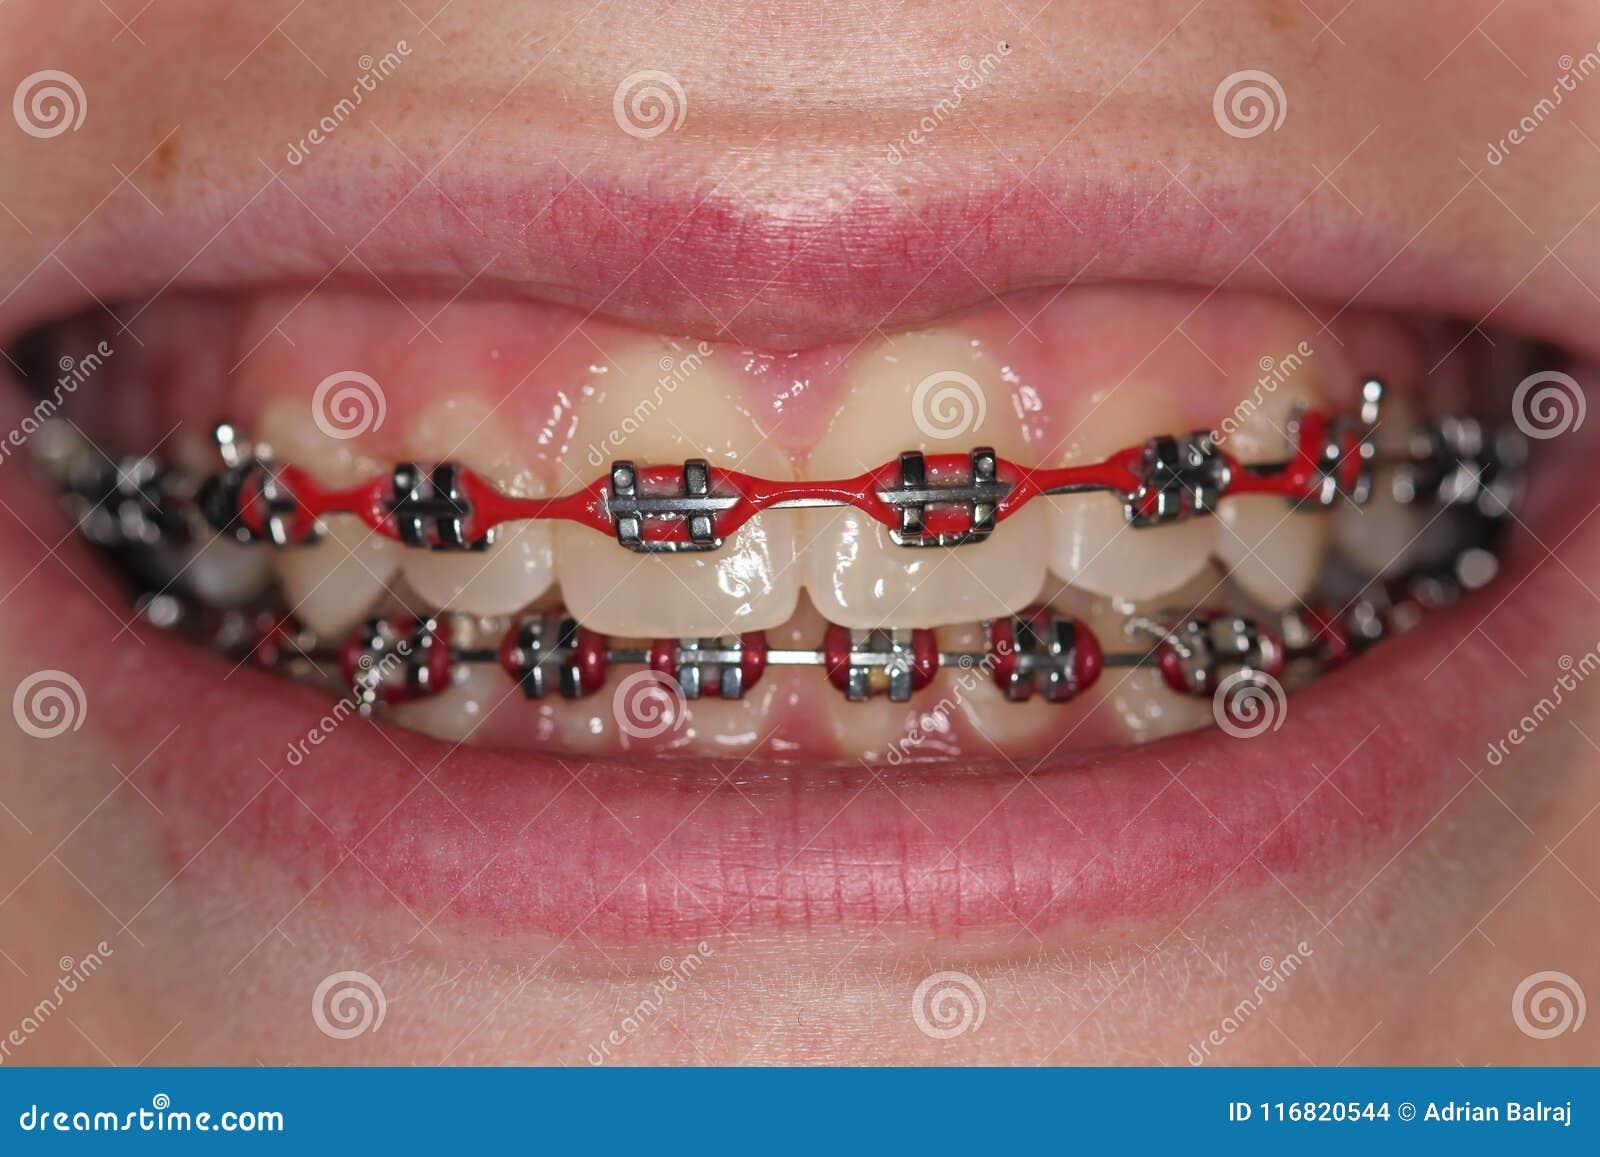 Teen With Red Metal Braces Orthodontics Brackets Stock Photo Image